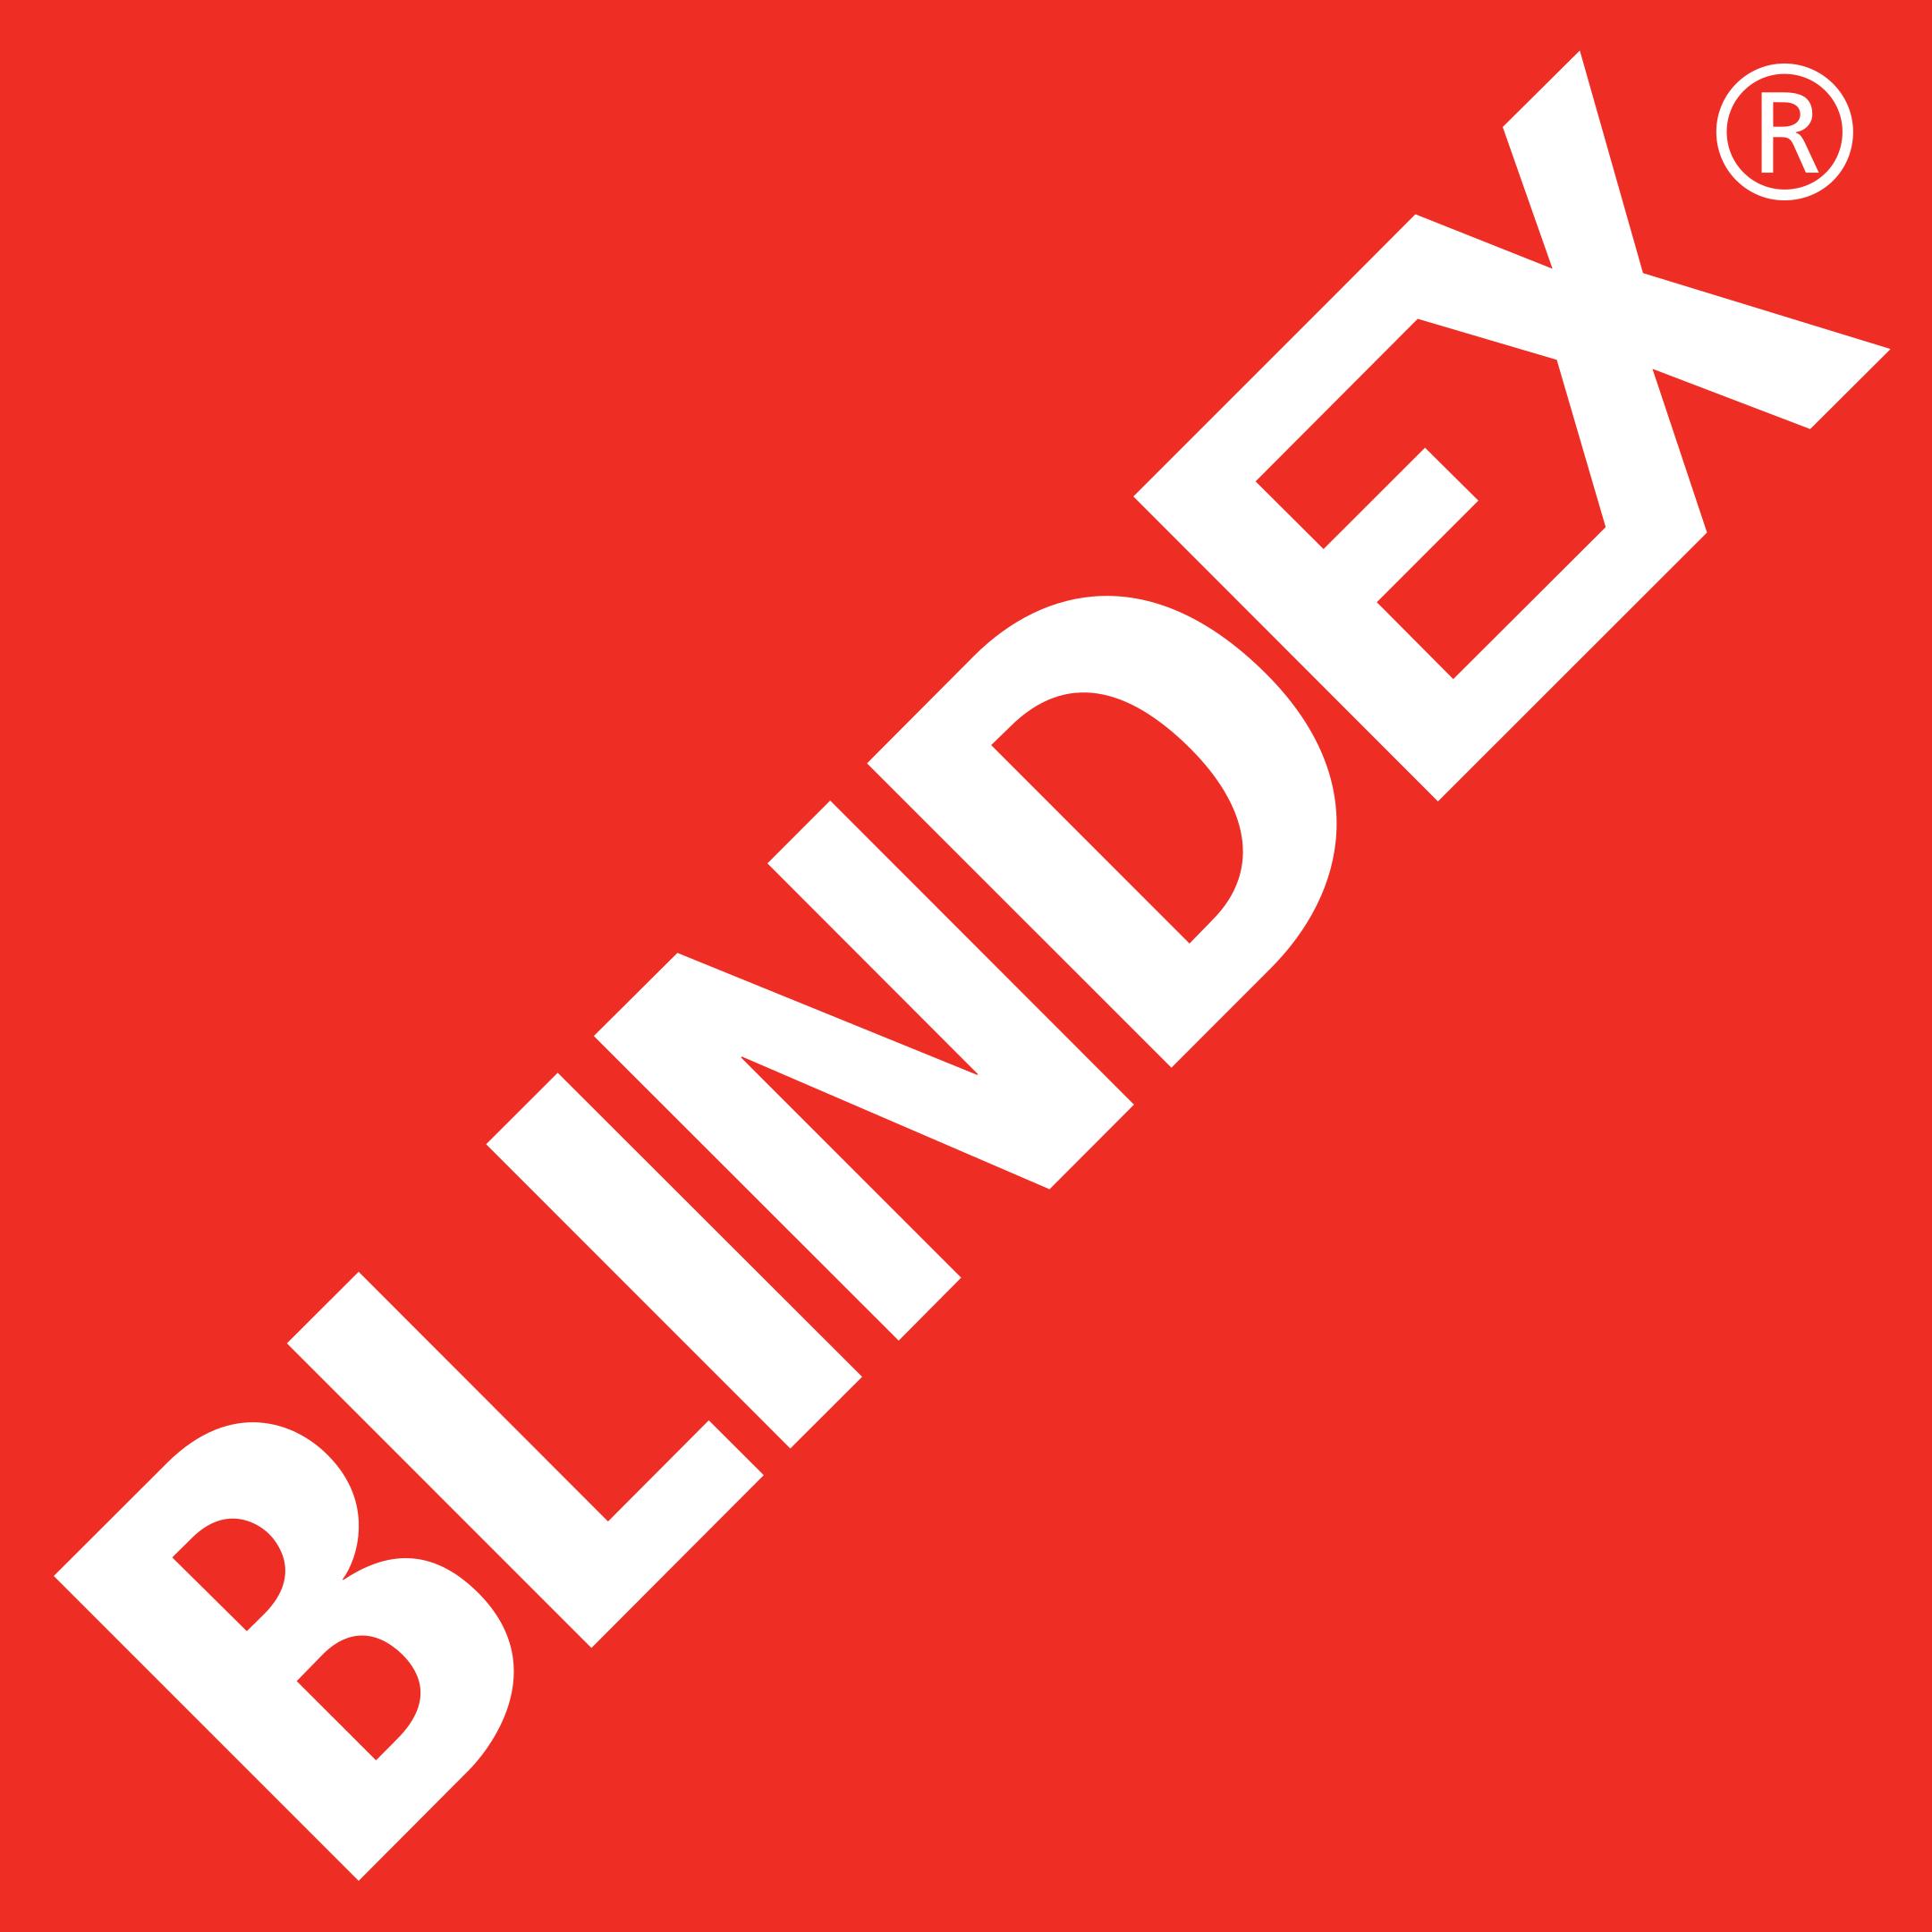 blindex logo 1 - Blindex Logo